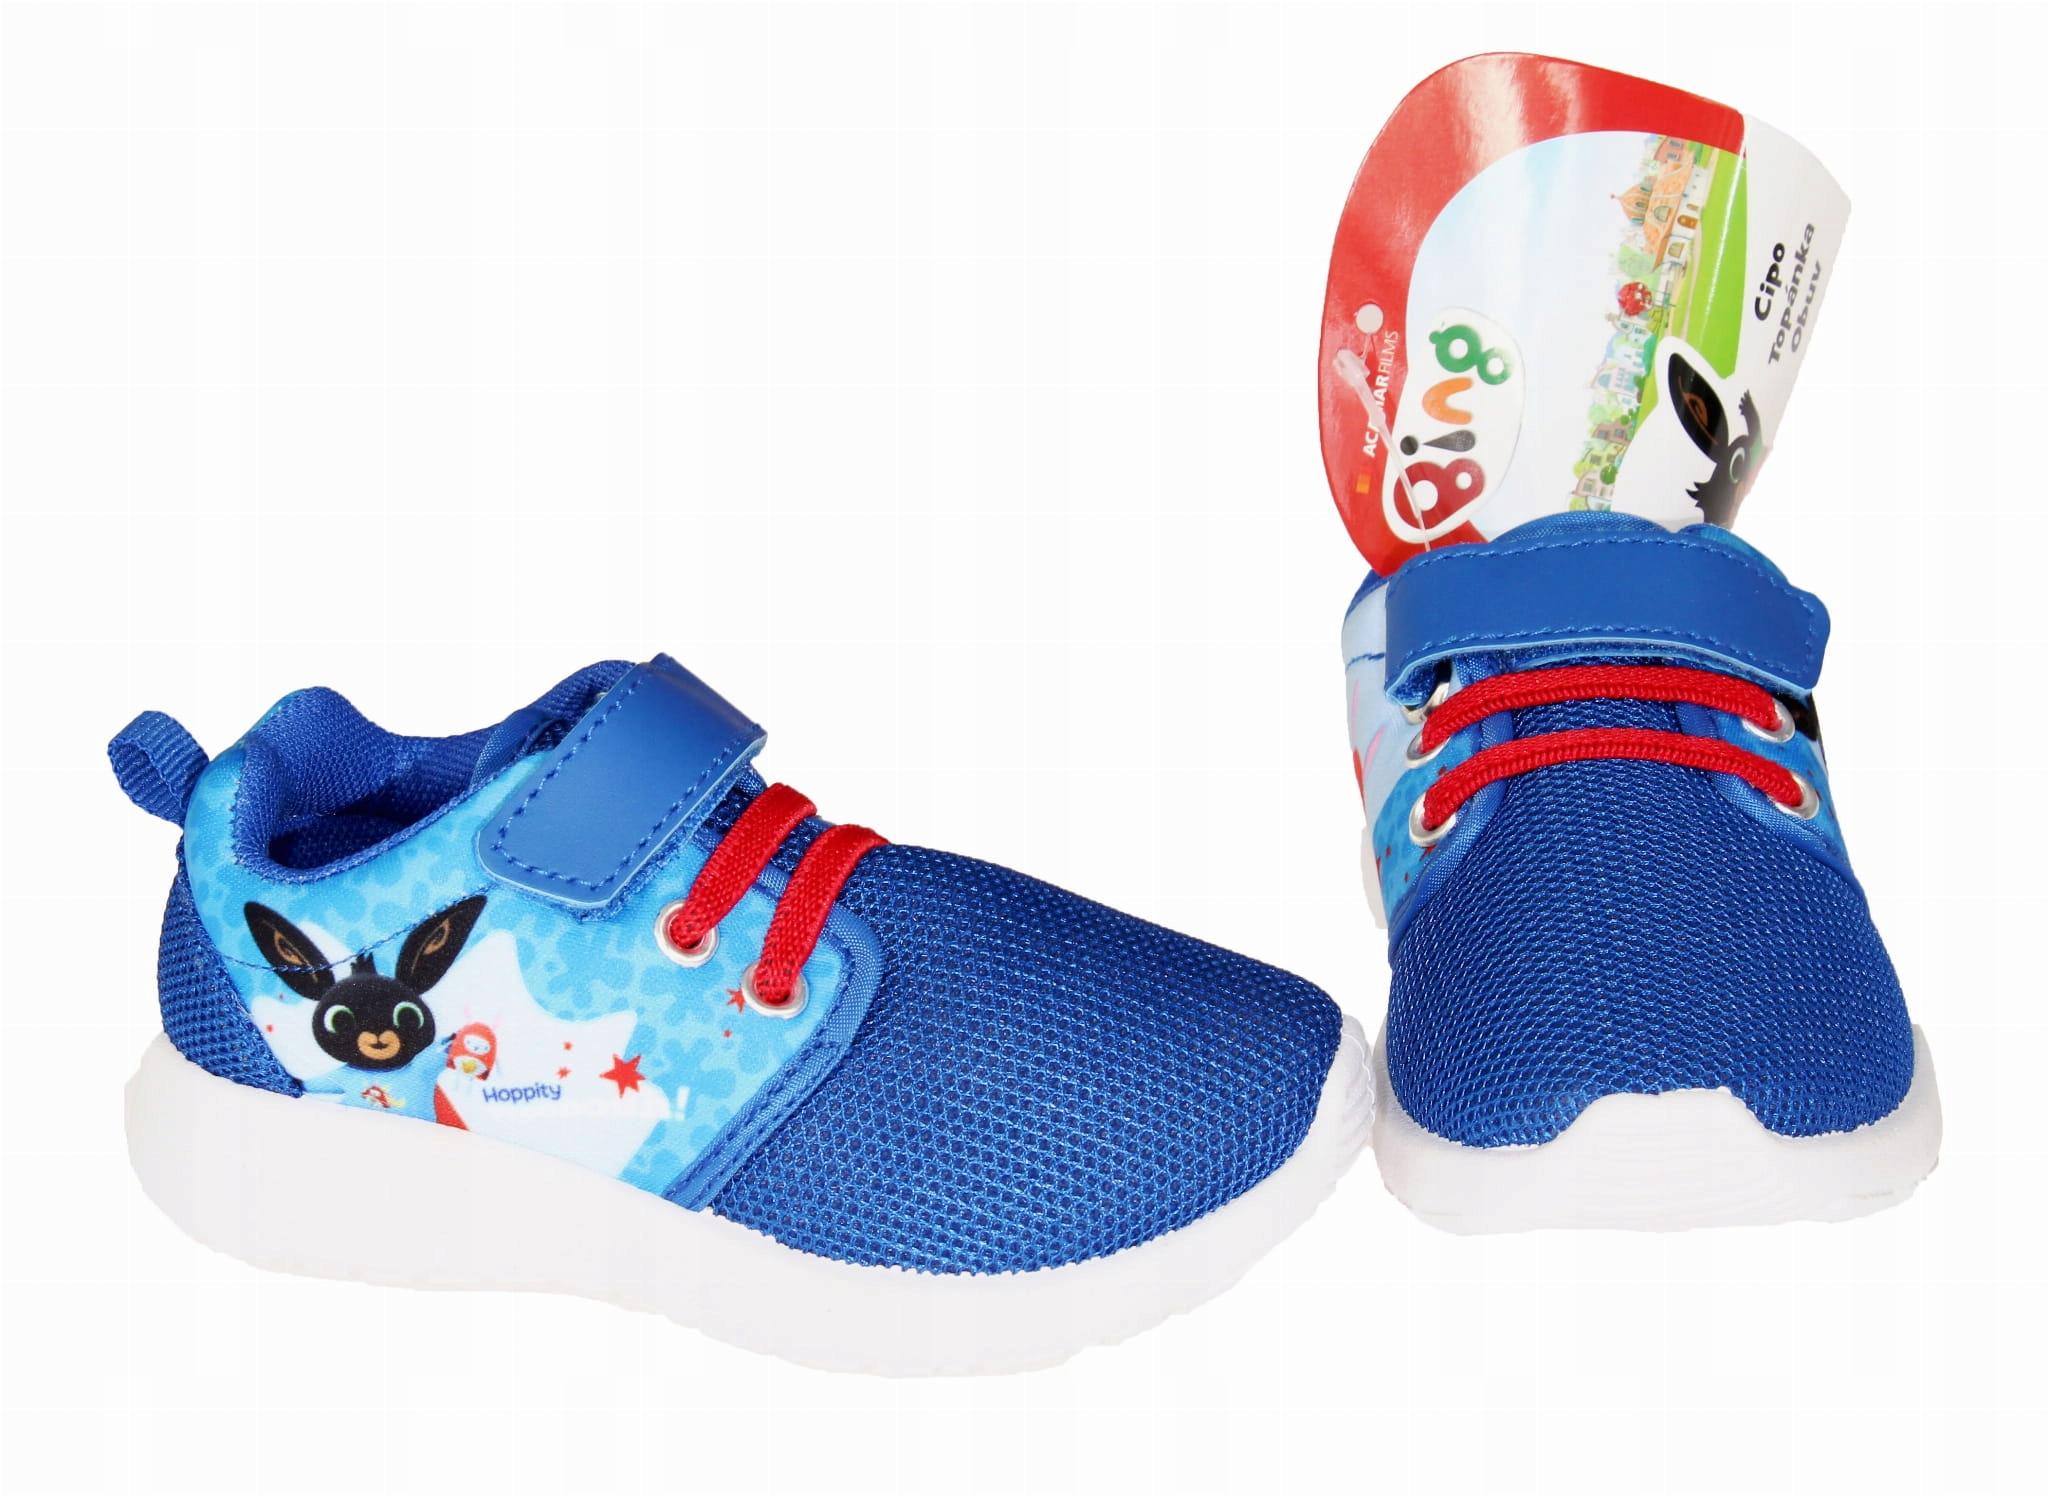 Športová obuv BING ADIDAS. 31 LICENCIA